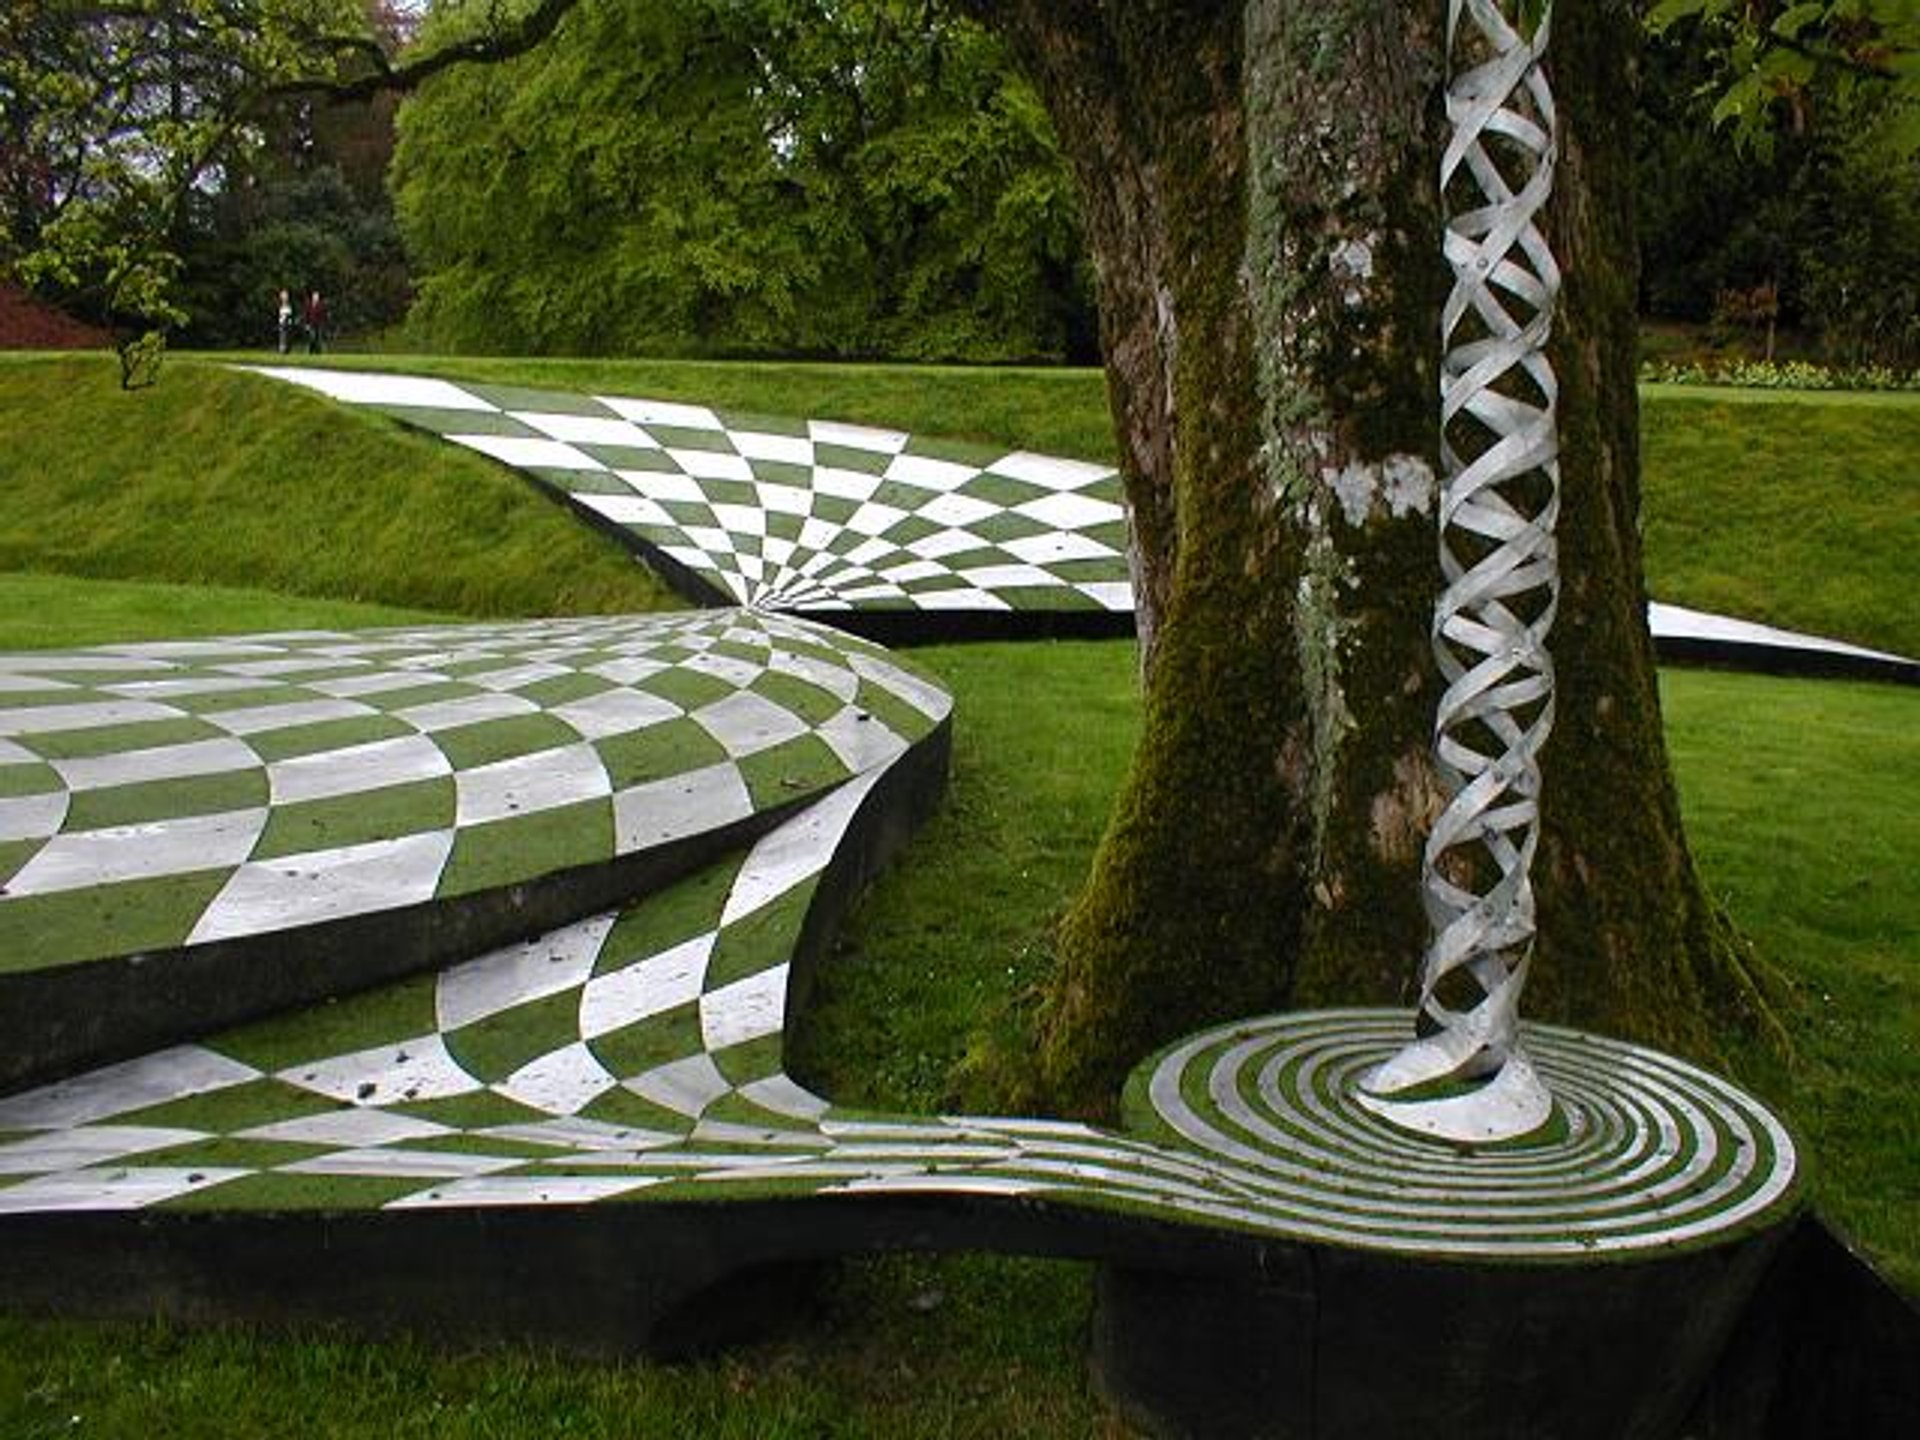 Garden of Cosmic Speculation in Scotland 2020 - Best Time